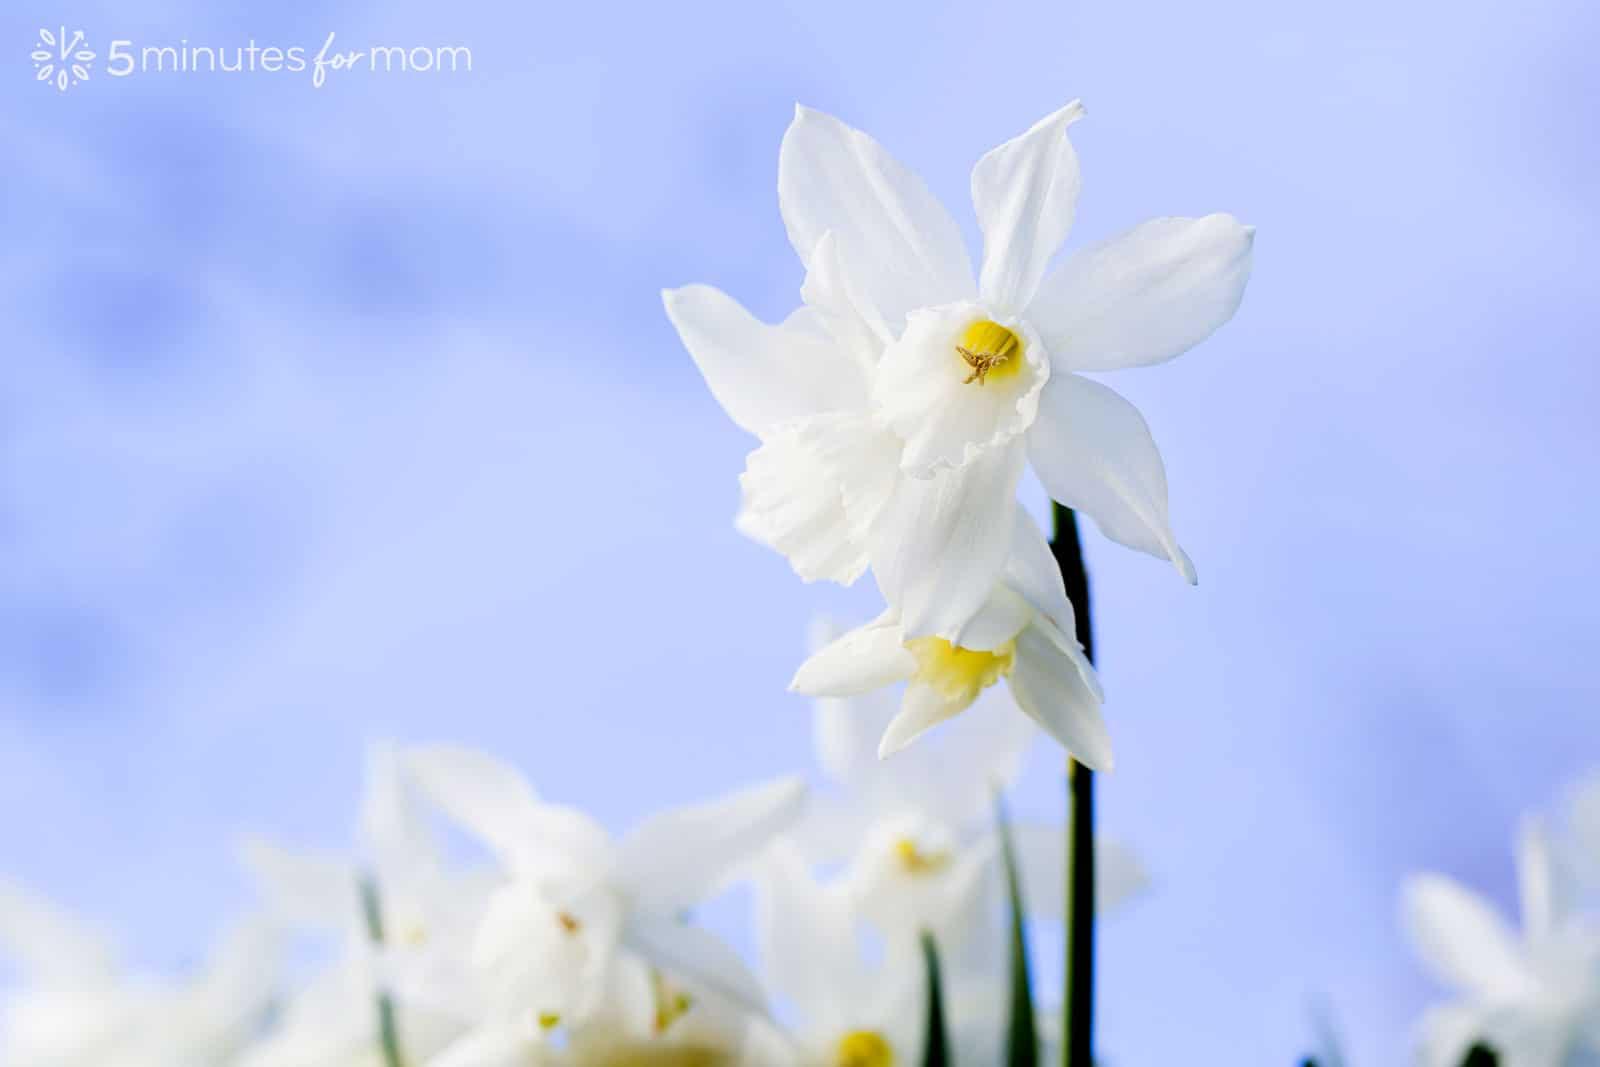 white daffodils against blue sky